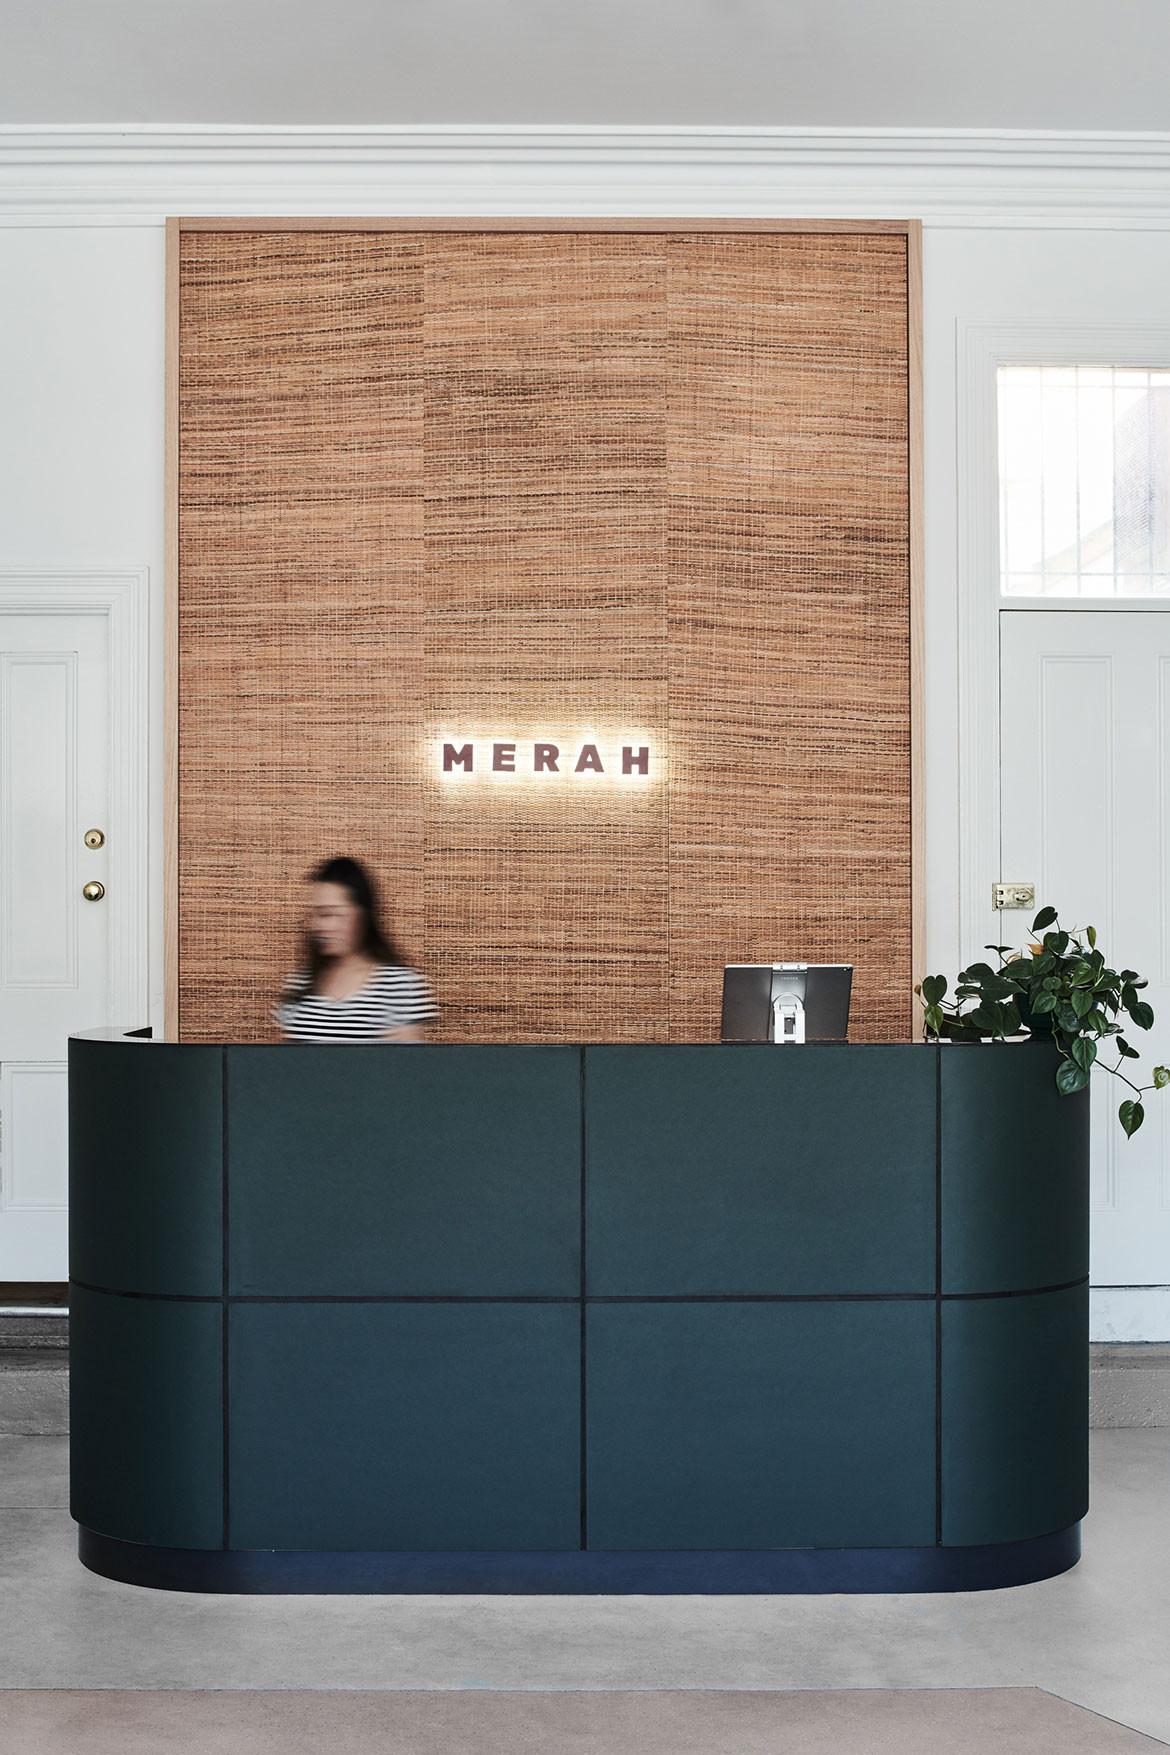 Merah One Design Office cc Tom Blachford entrance